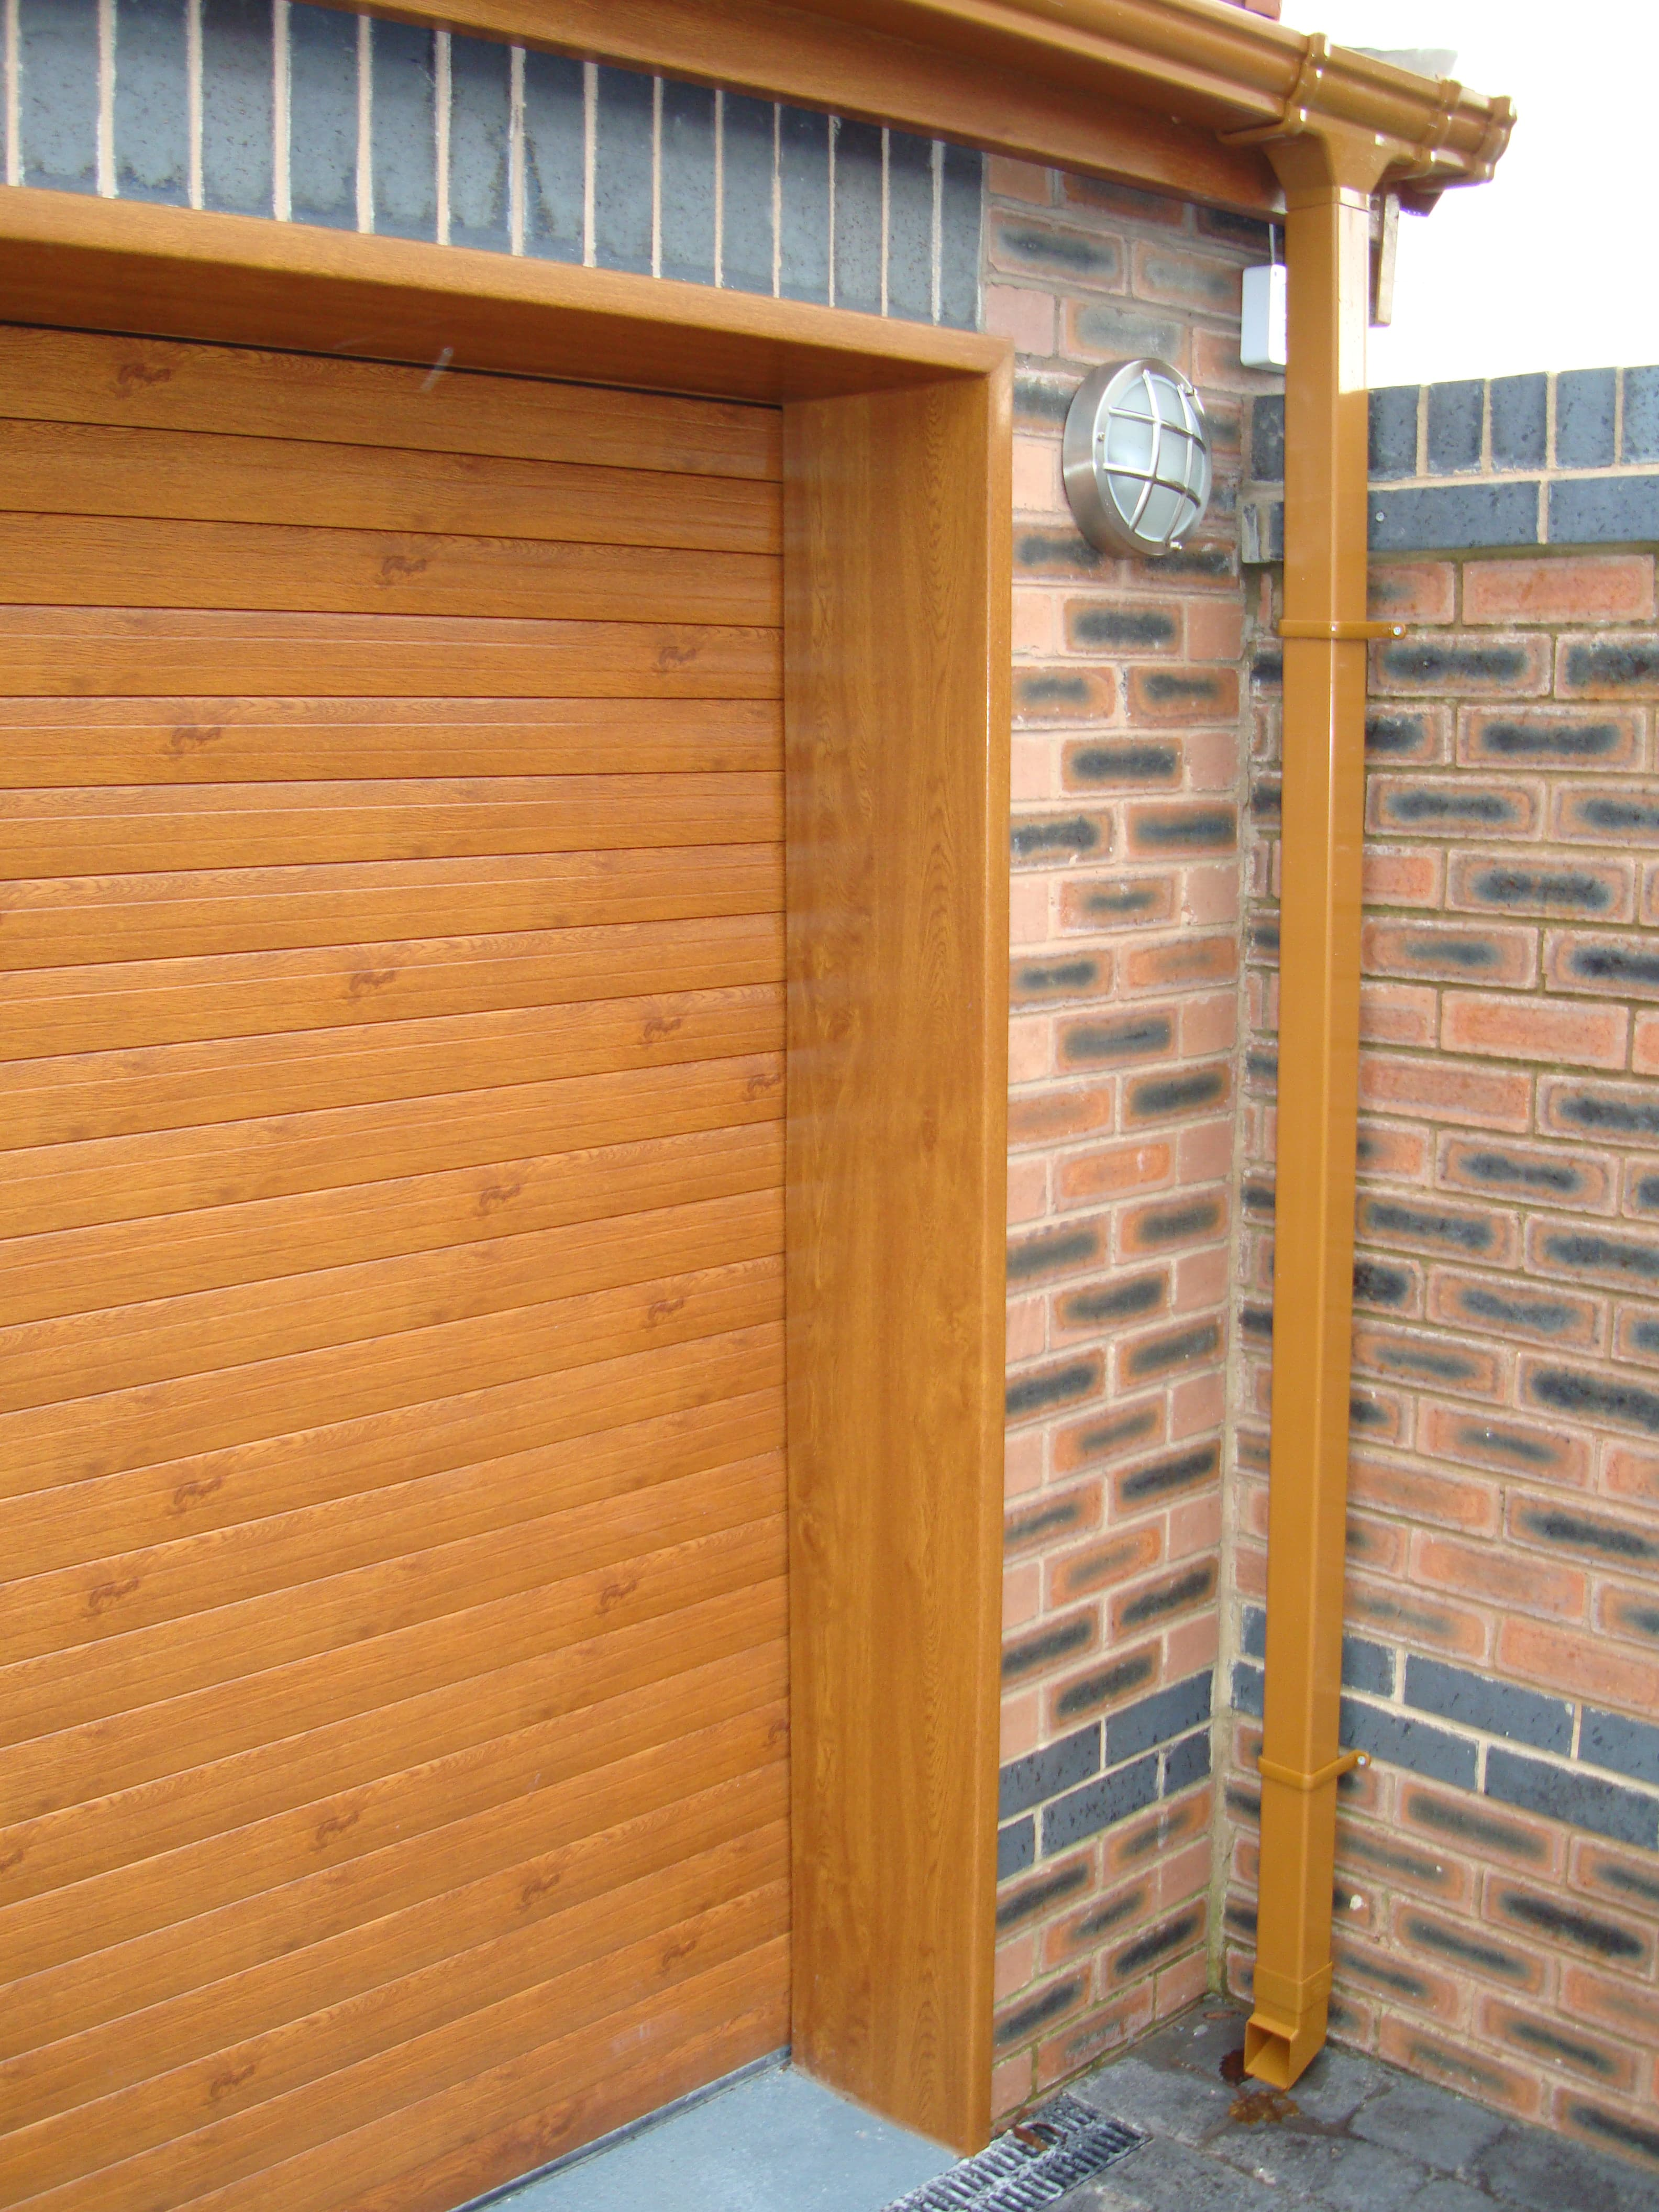 Secure Garage Doors Liverpool Wirral Amp Warrington All